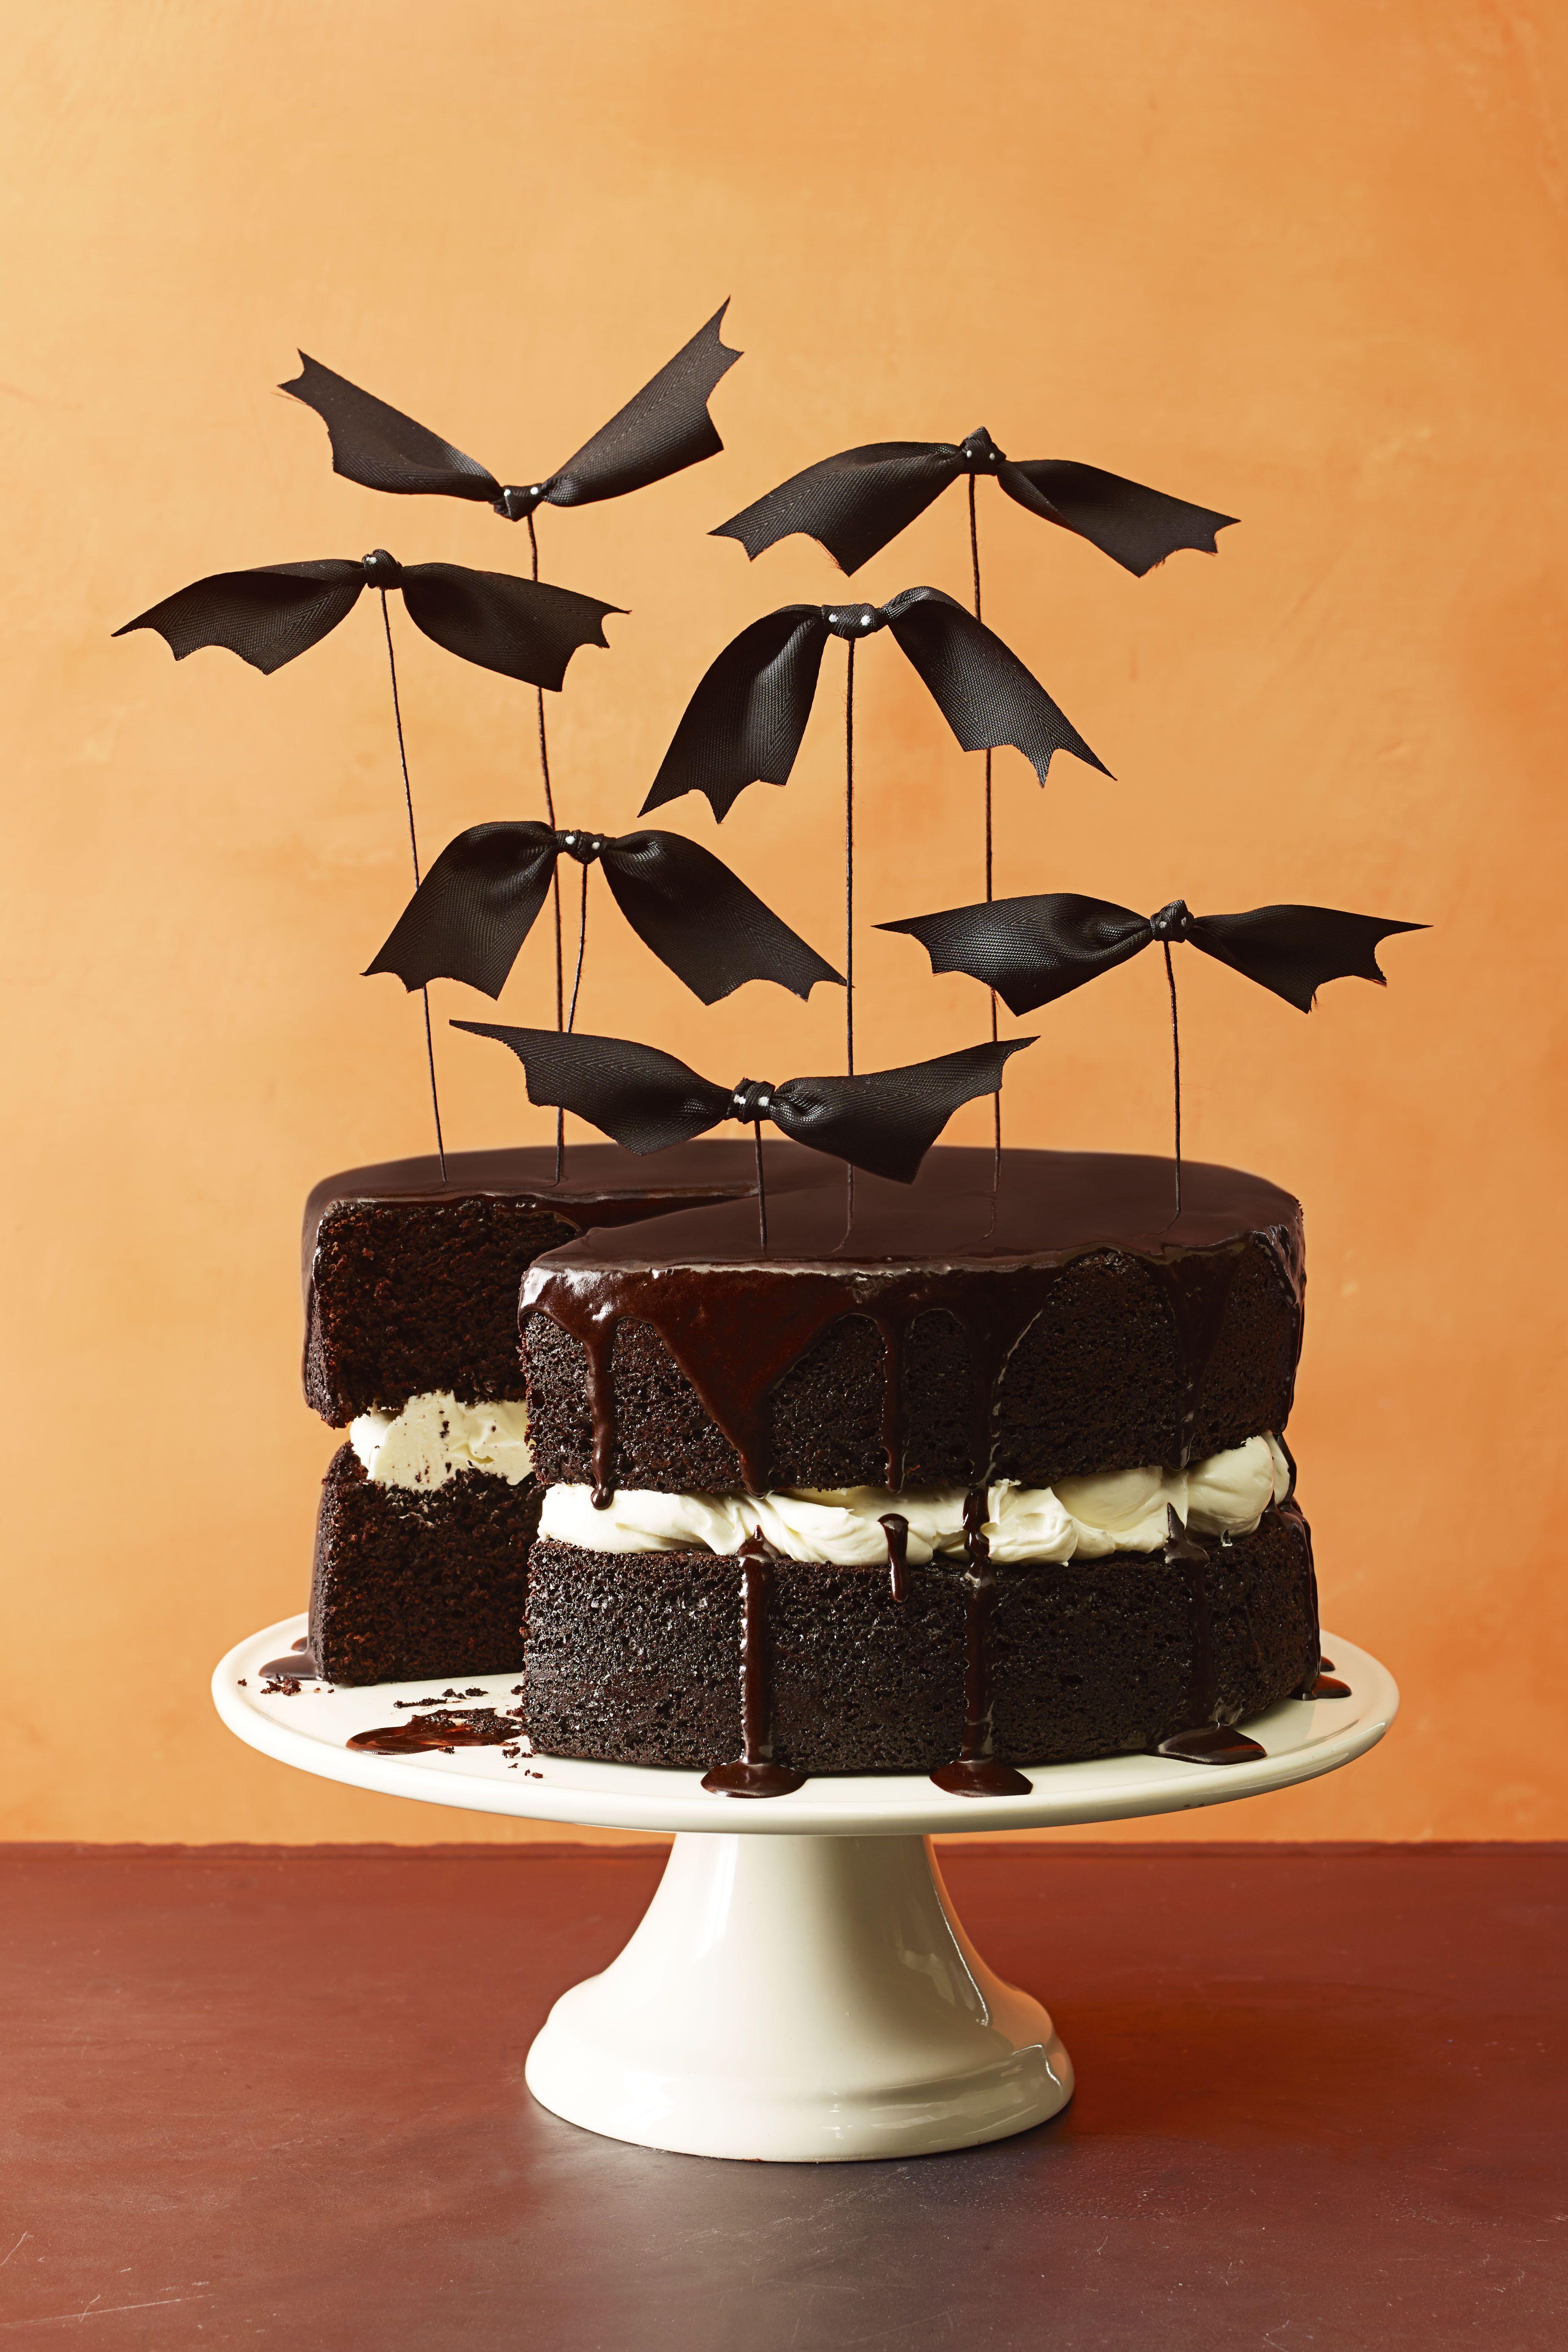 60 Best Halloween Desserts Easy Halloween Dessert Recipes And Ideas